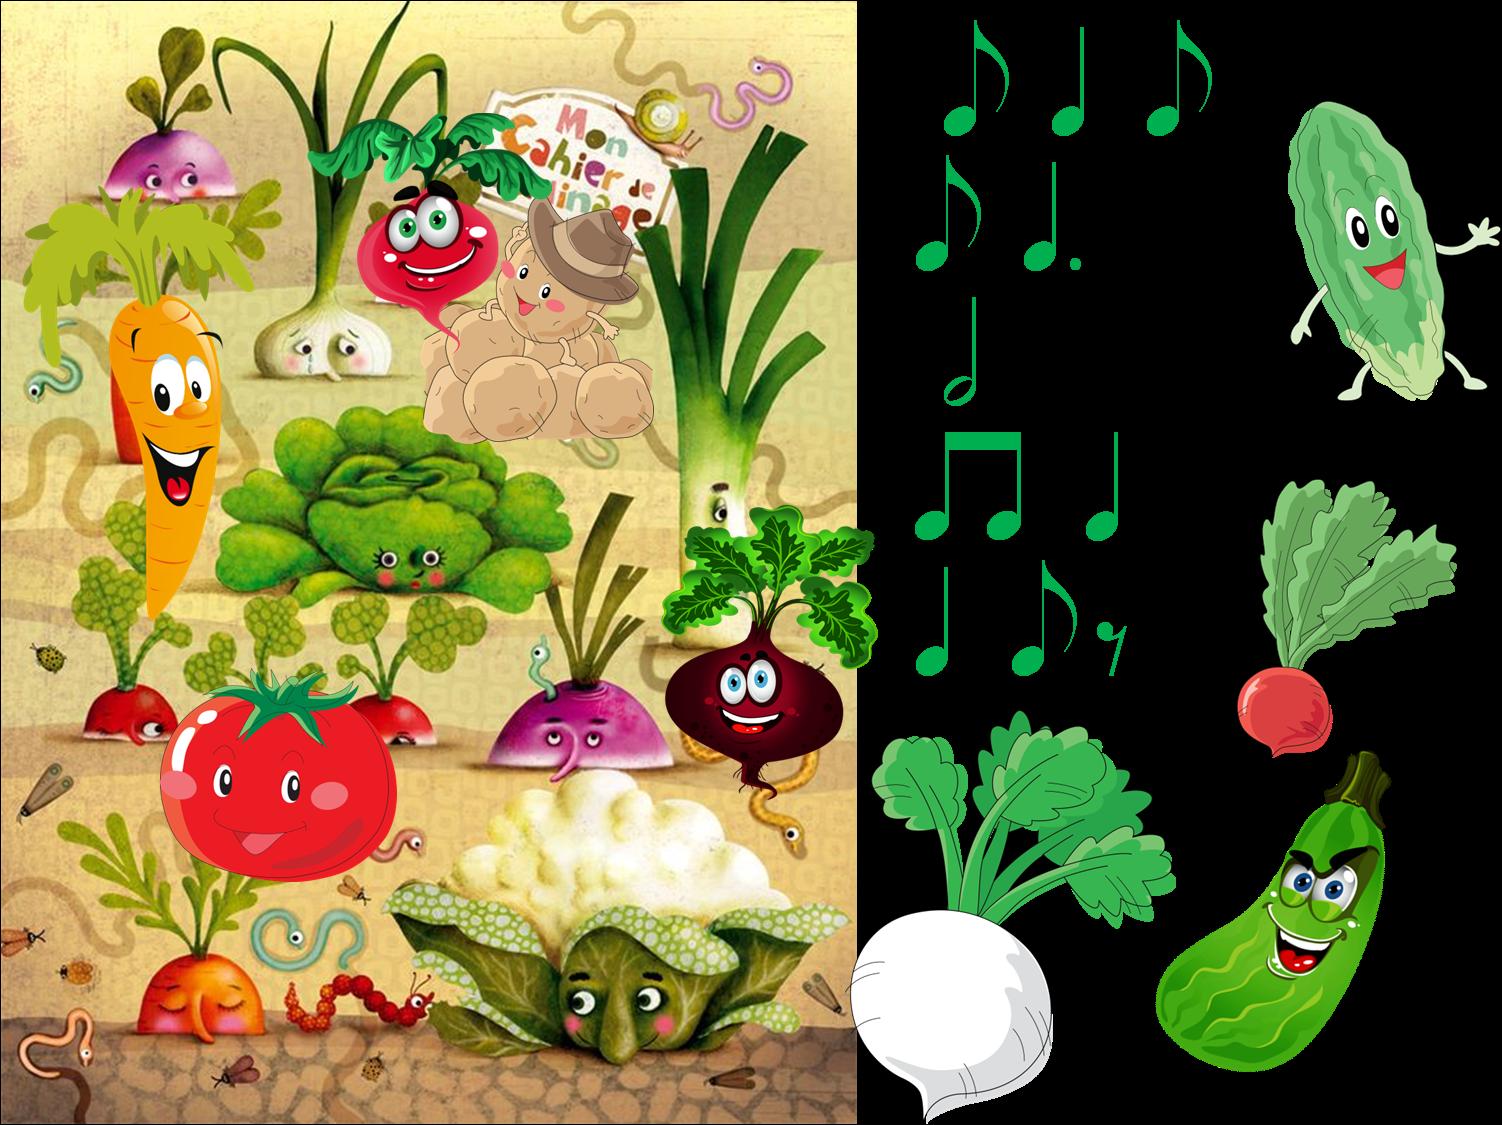 овощи на грядке картинка для детей